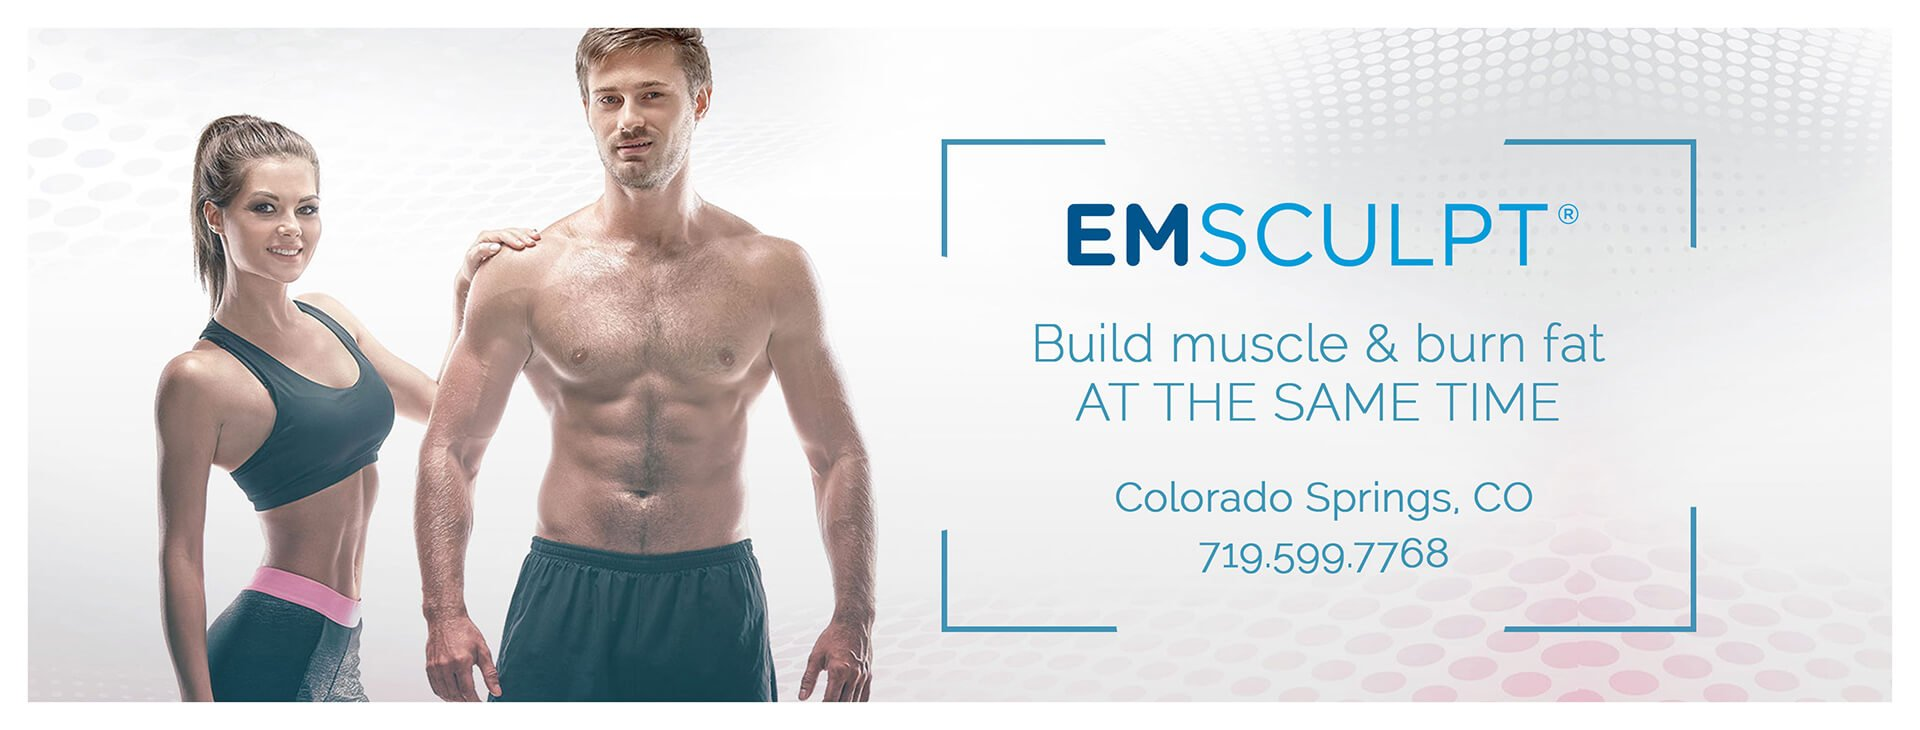 Welcome to Premier MediSpa - Premier MediSpa | Colorado Springs